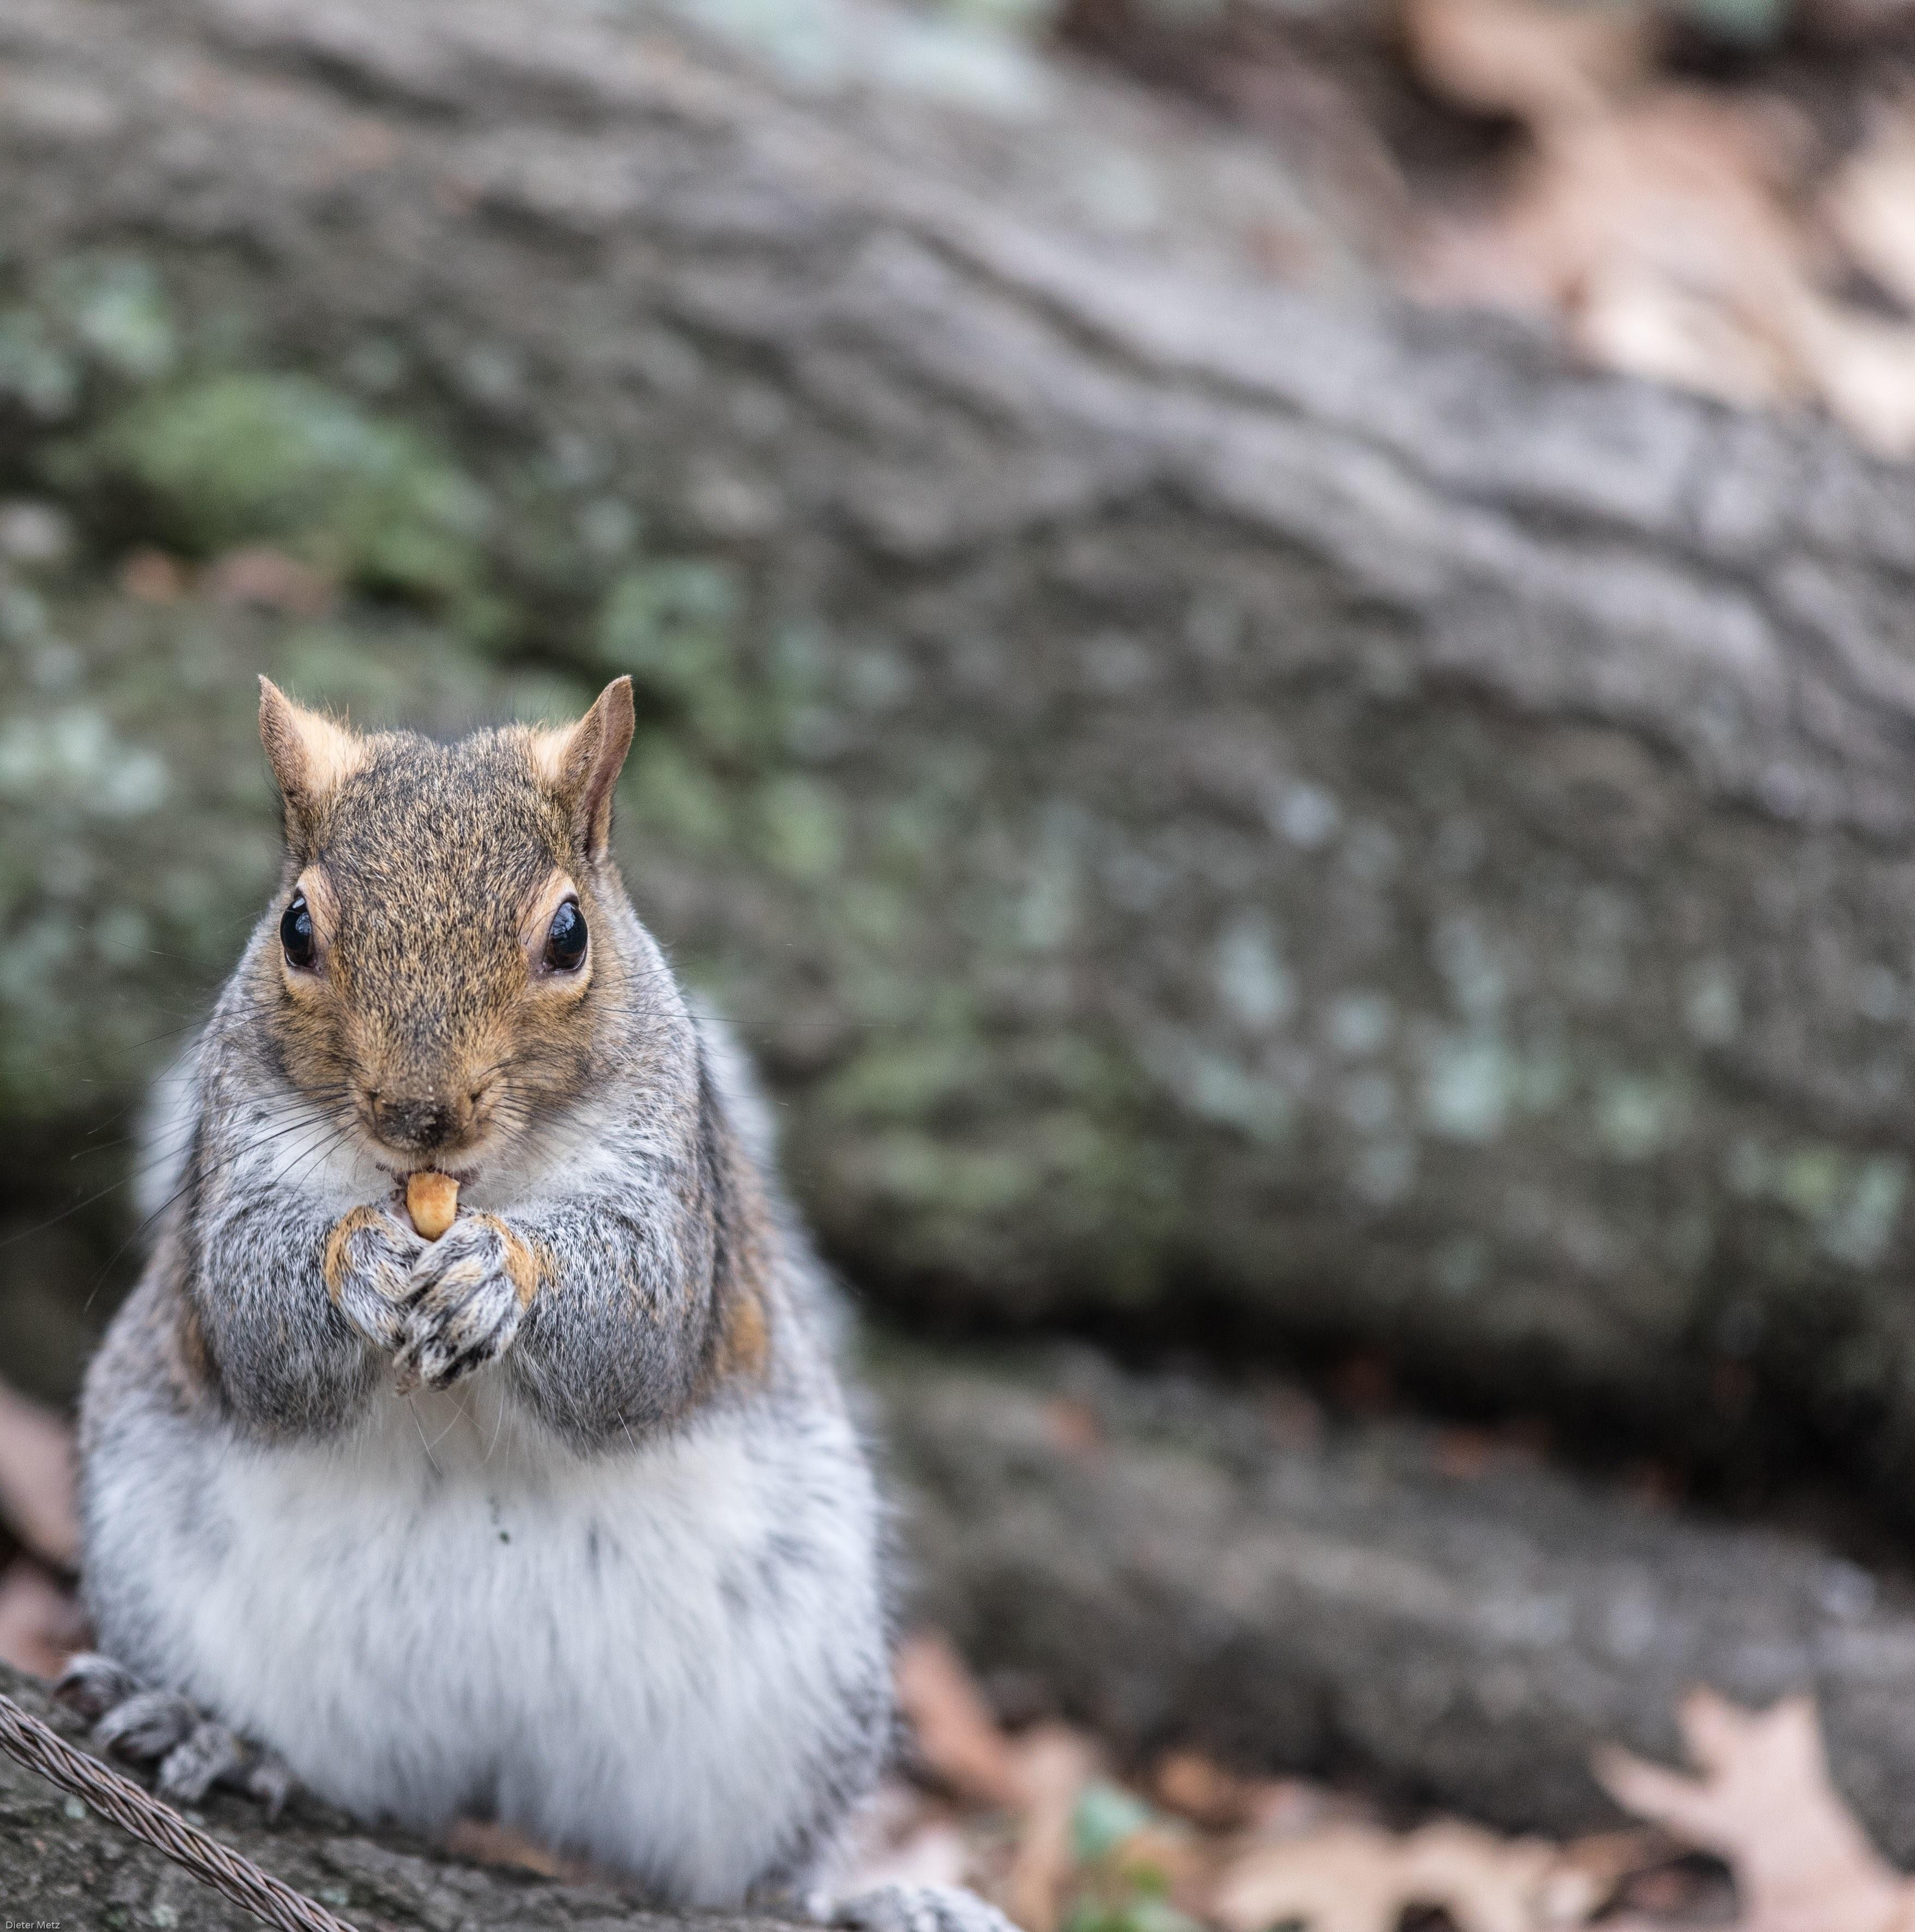 free images sweet cute wildlife fur fluffy mammal squirrel